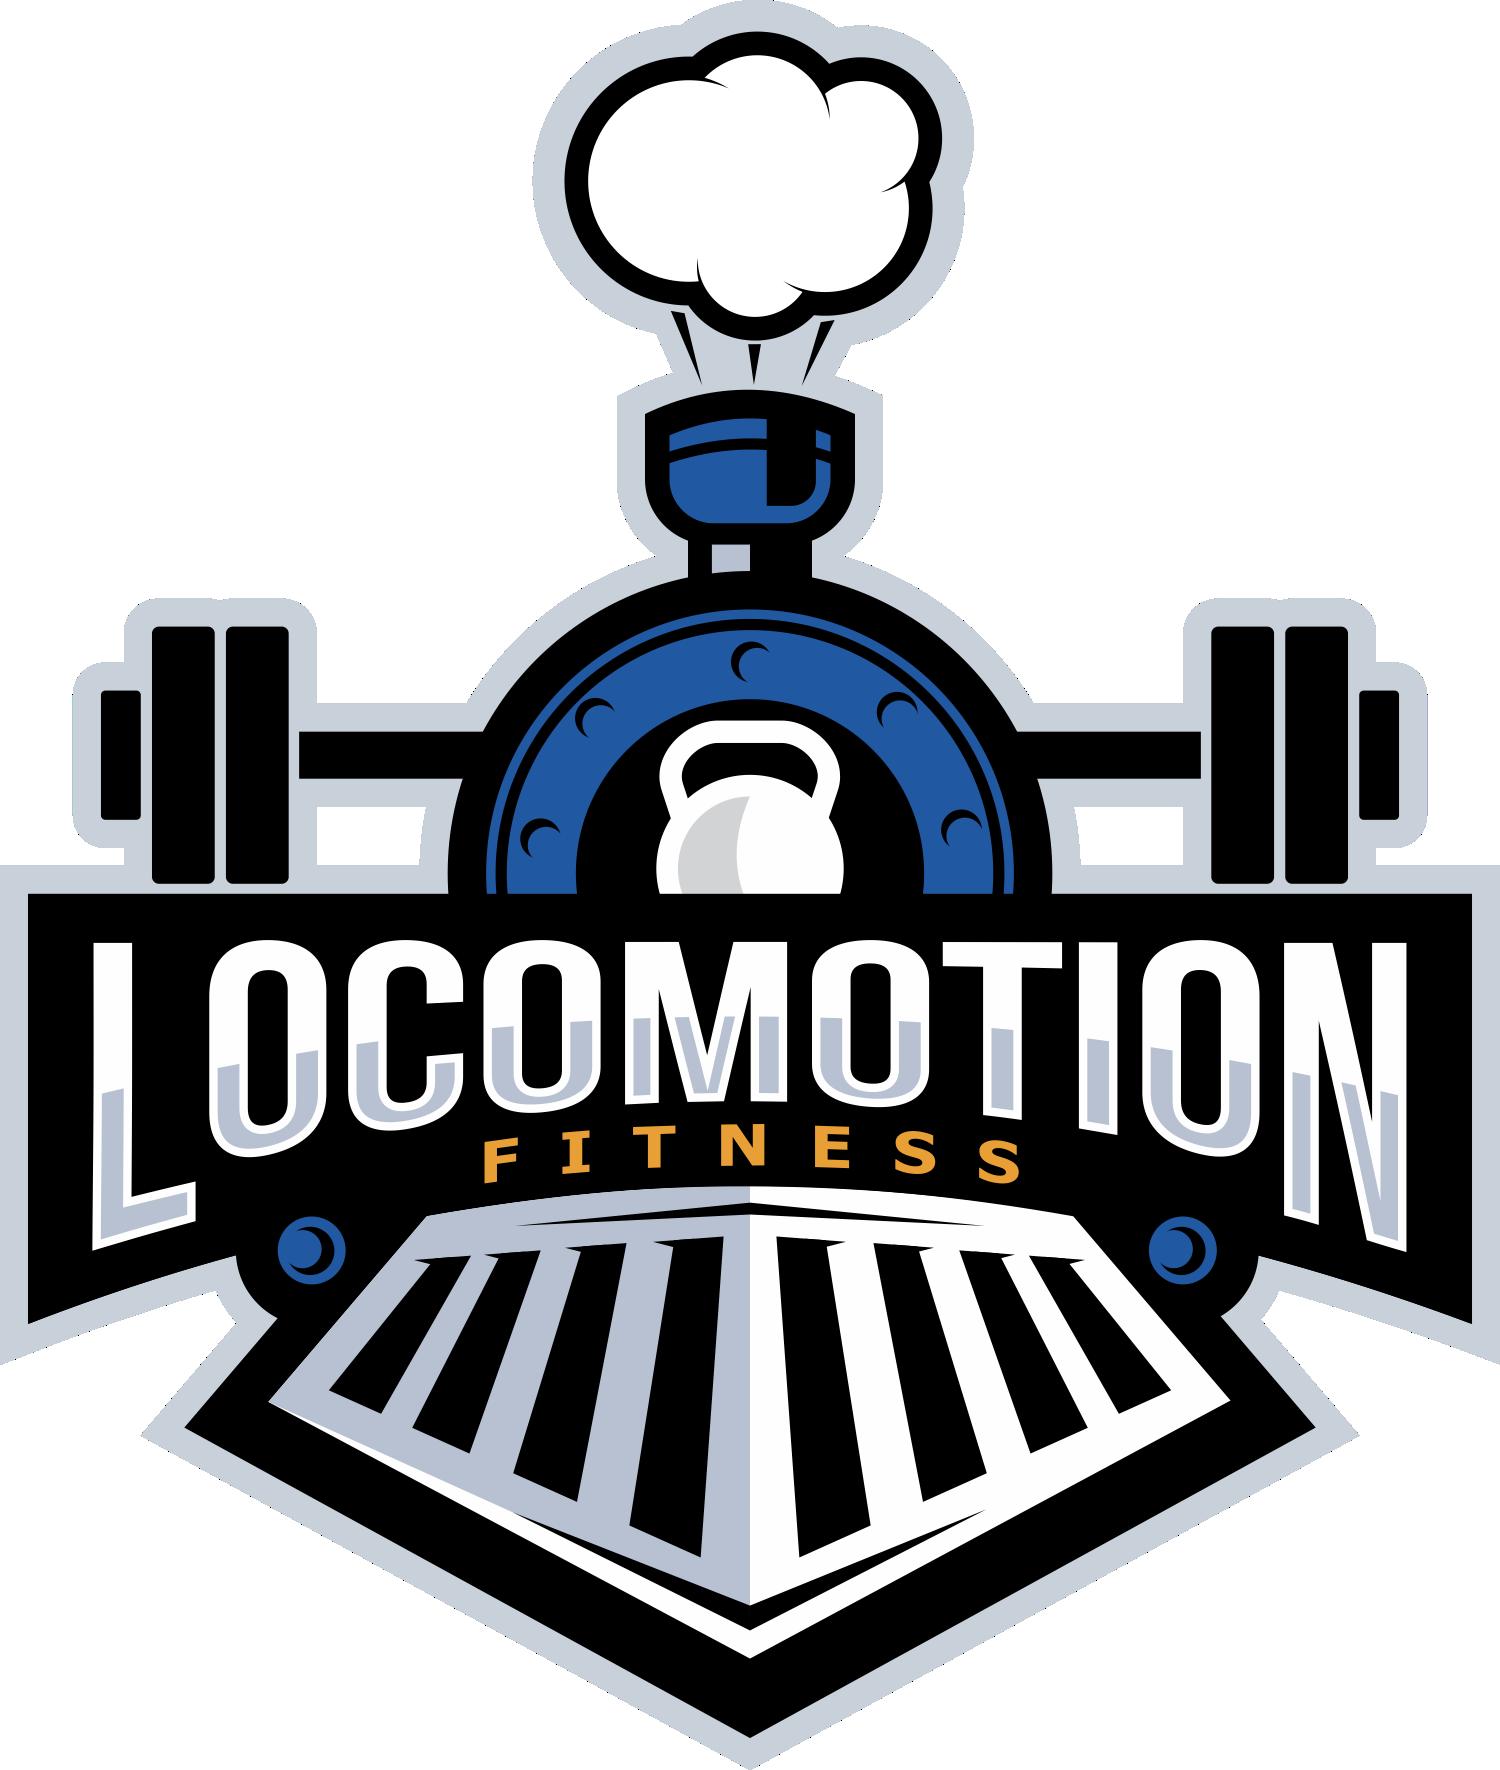 Locomotion Fitness logo